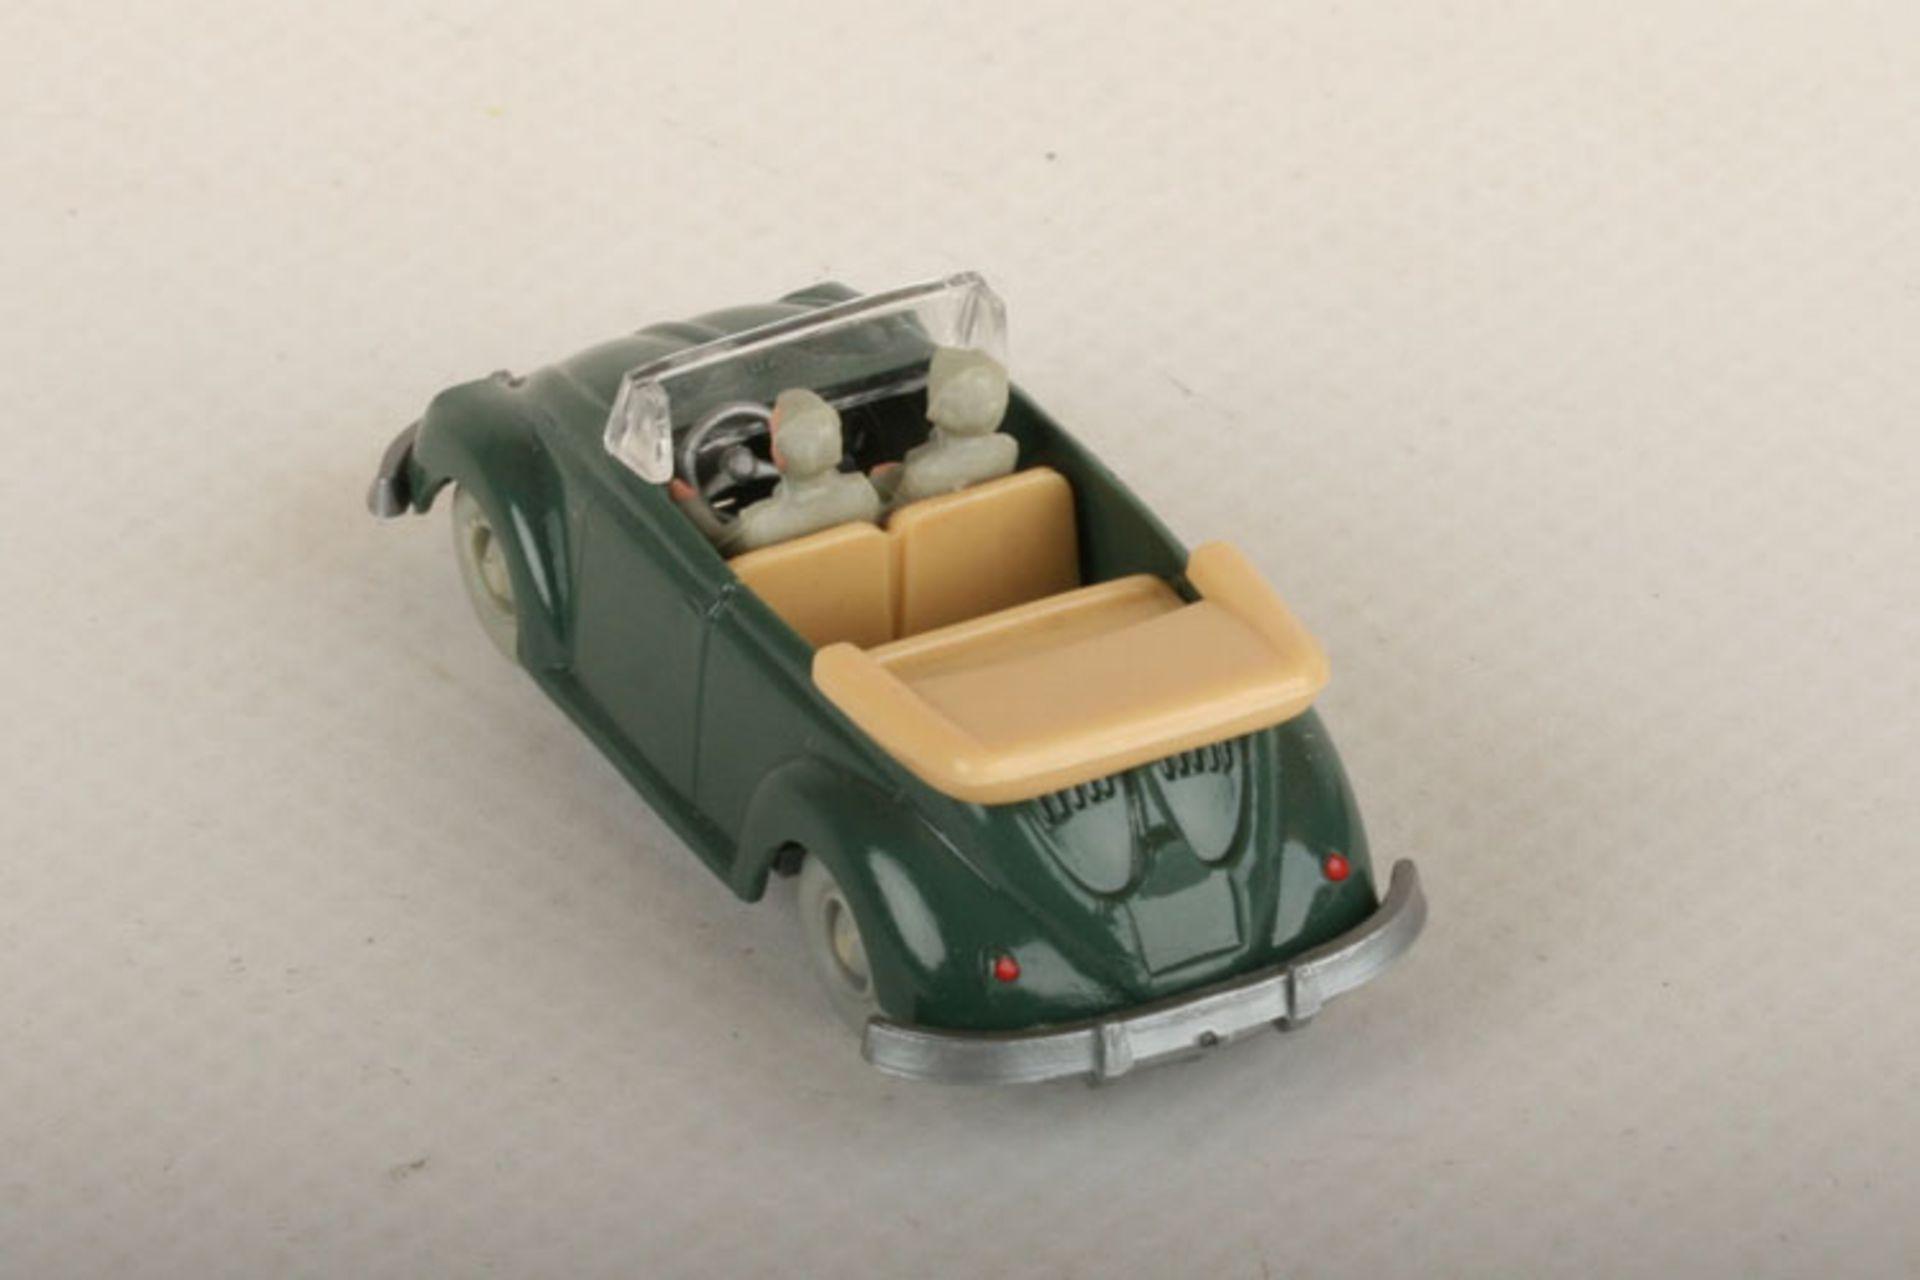 Los 1013 - Wiking VW Käfer Cabrio h'patinagrün (silbernes Lenkrad) 33/5i, IE h'beige, neuwertig